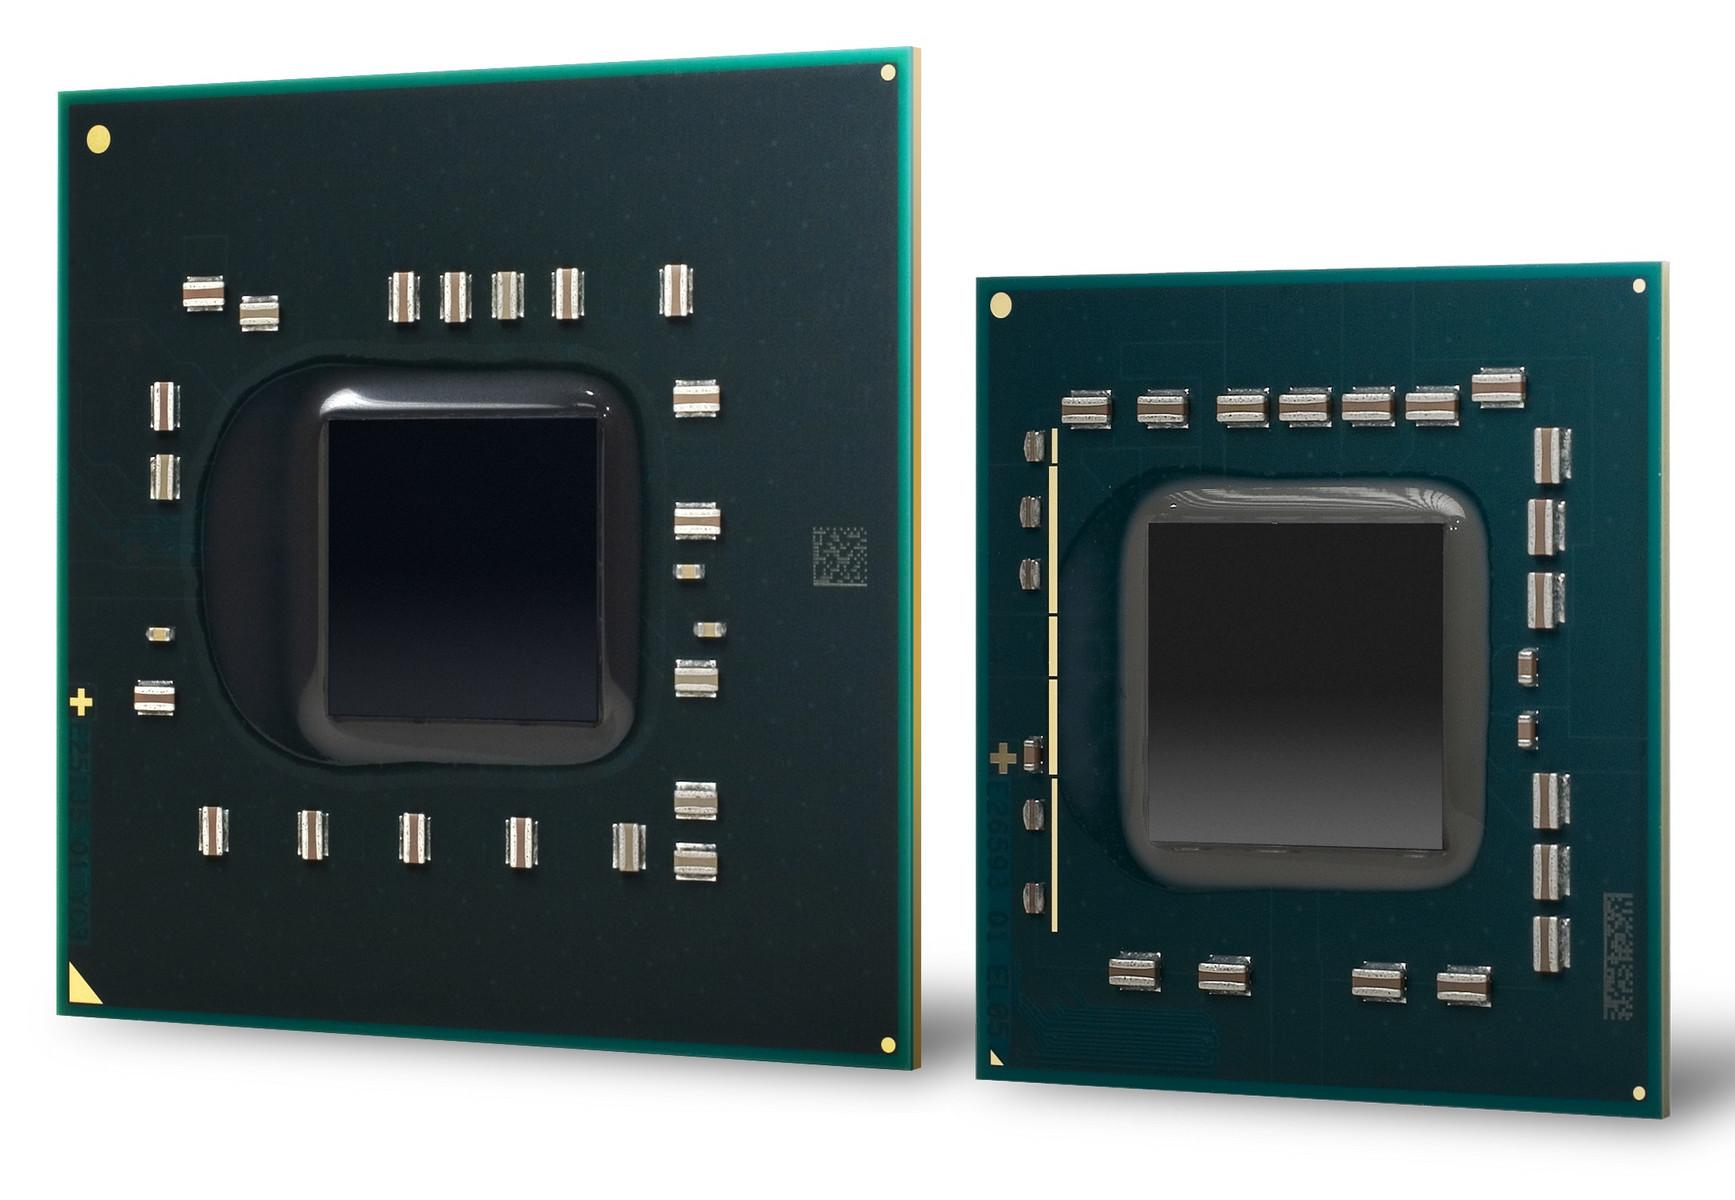 Peaceably Intel Graphics Media Accelerator Intel Graphics Media Accelerator Ati Radeon Hd 4200 Driver Windows 10 Free Download Ati Radeon Hd 4200 Driver Windows 10 64 Bit Download dpreview Ati Radeon Hd 4200 Windows 10